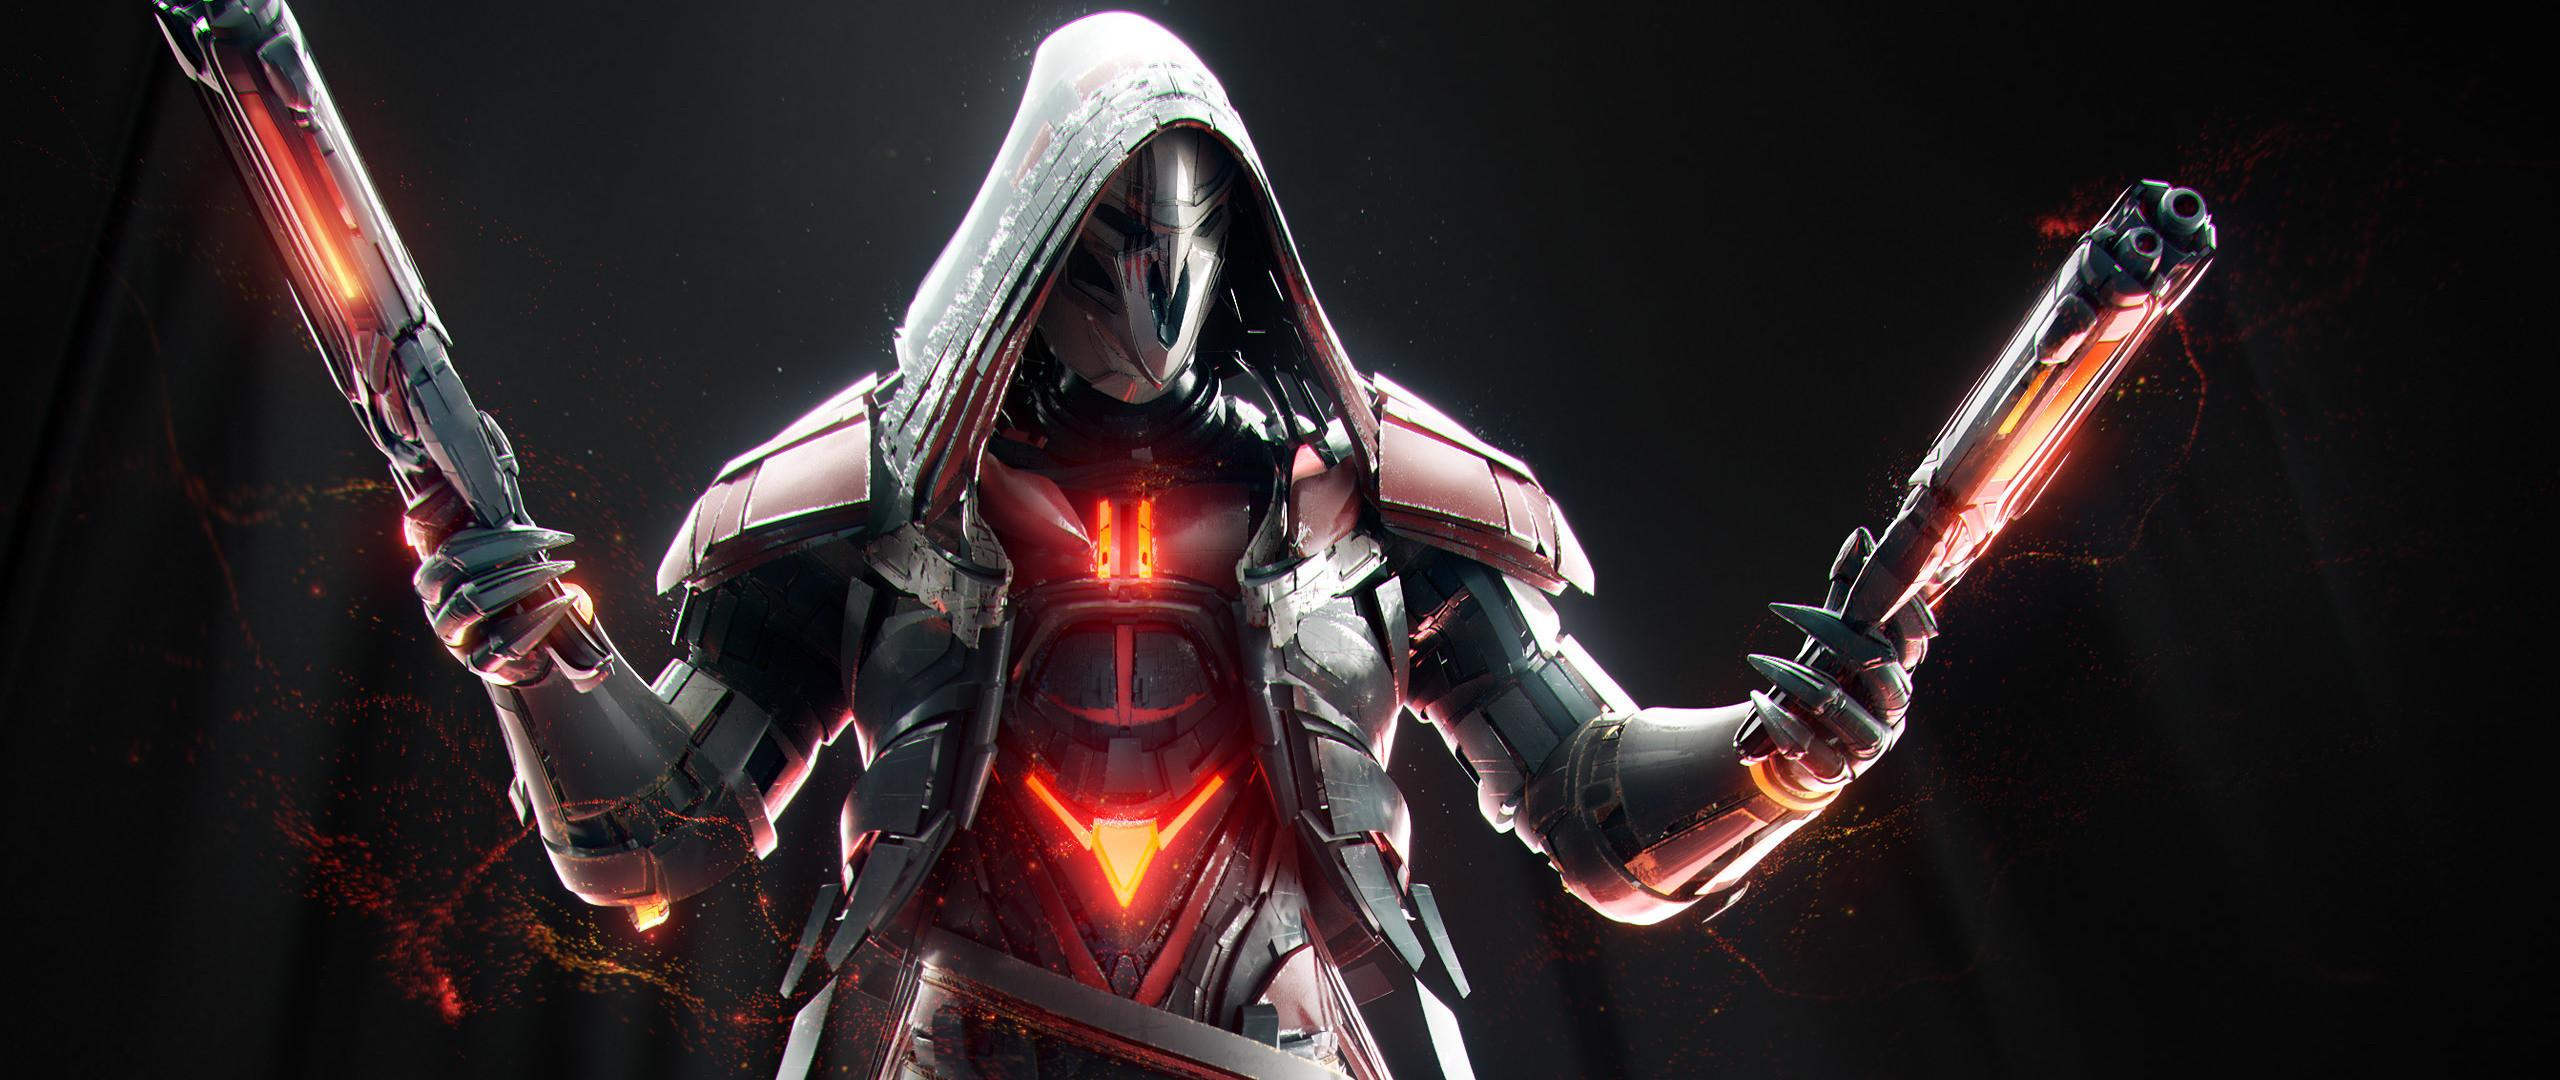 Res: 2560x1080, reaper-overwatch-artwork-hd-o3.jpg